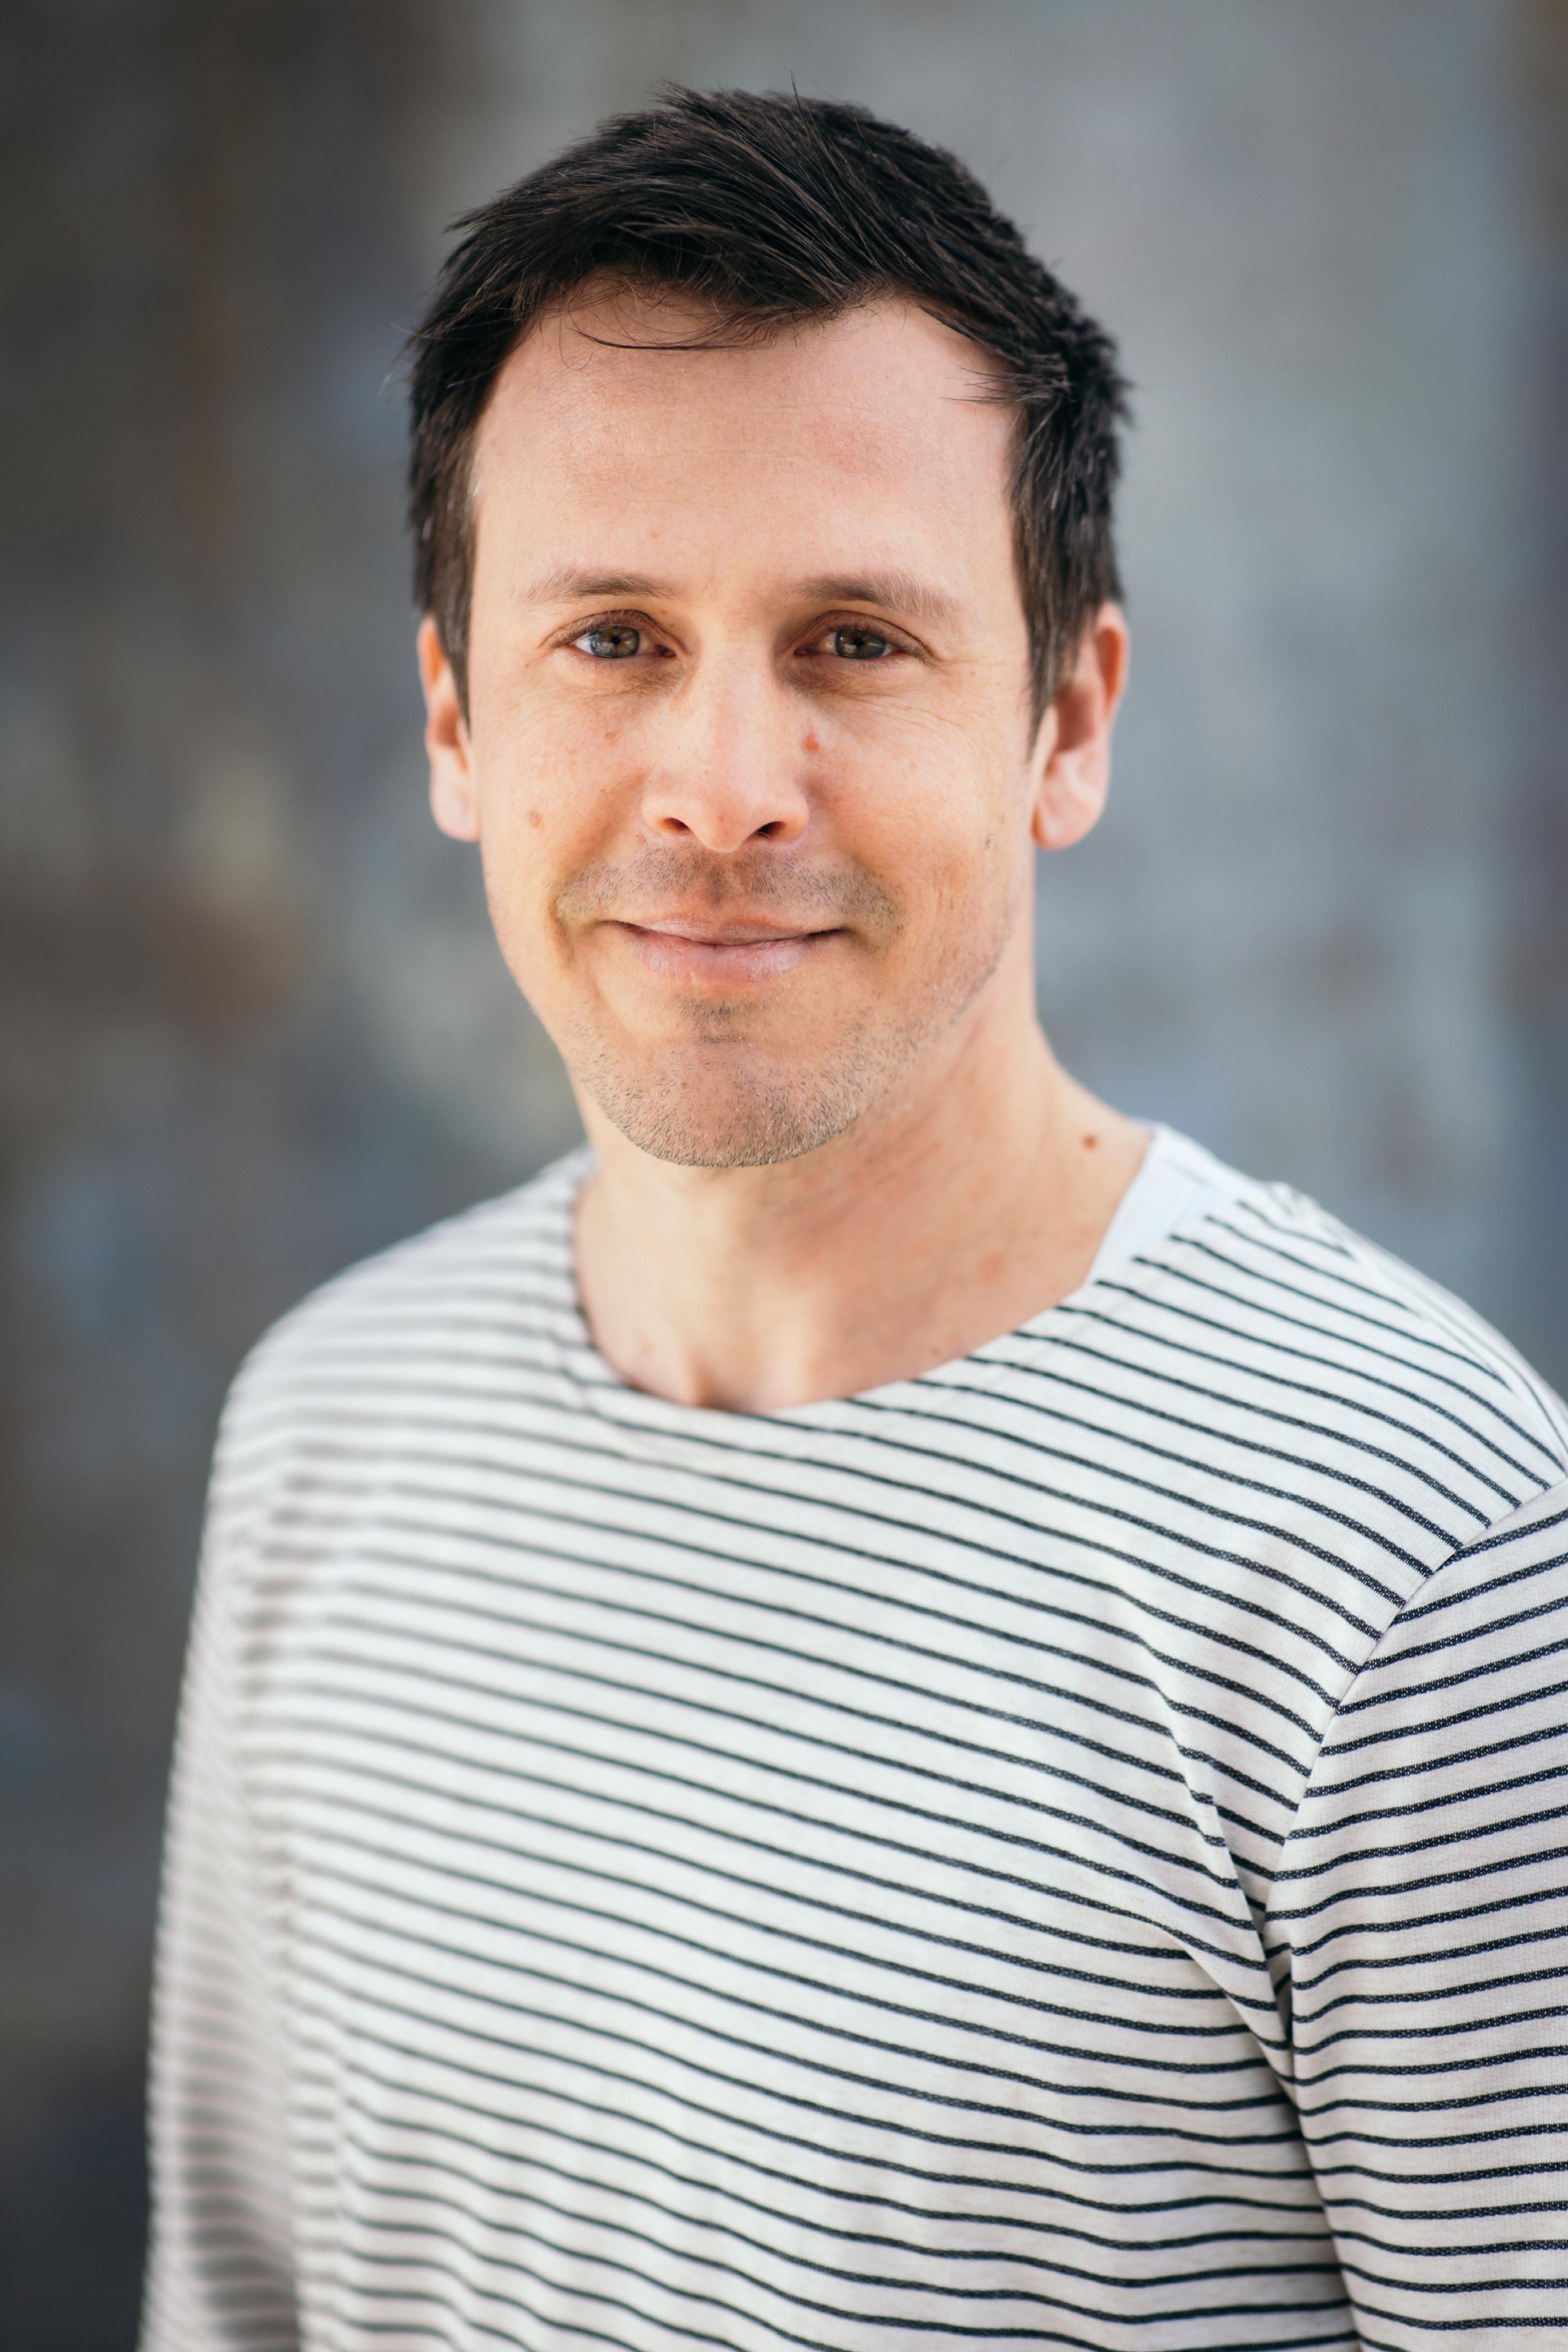 Filip Lendahls